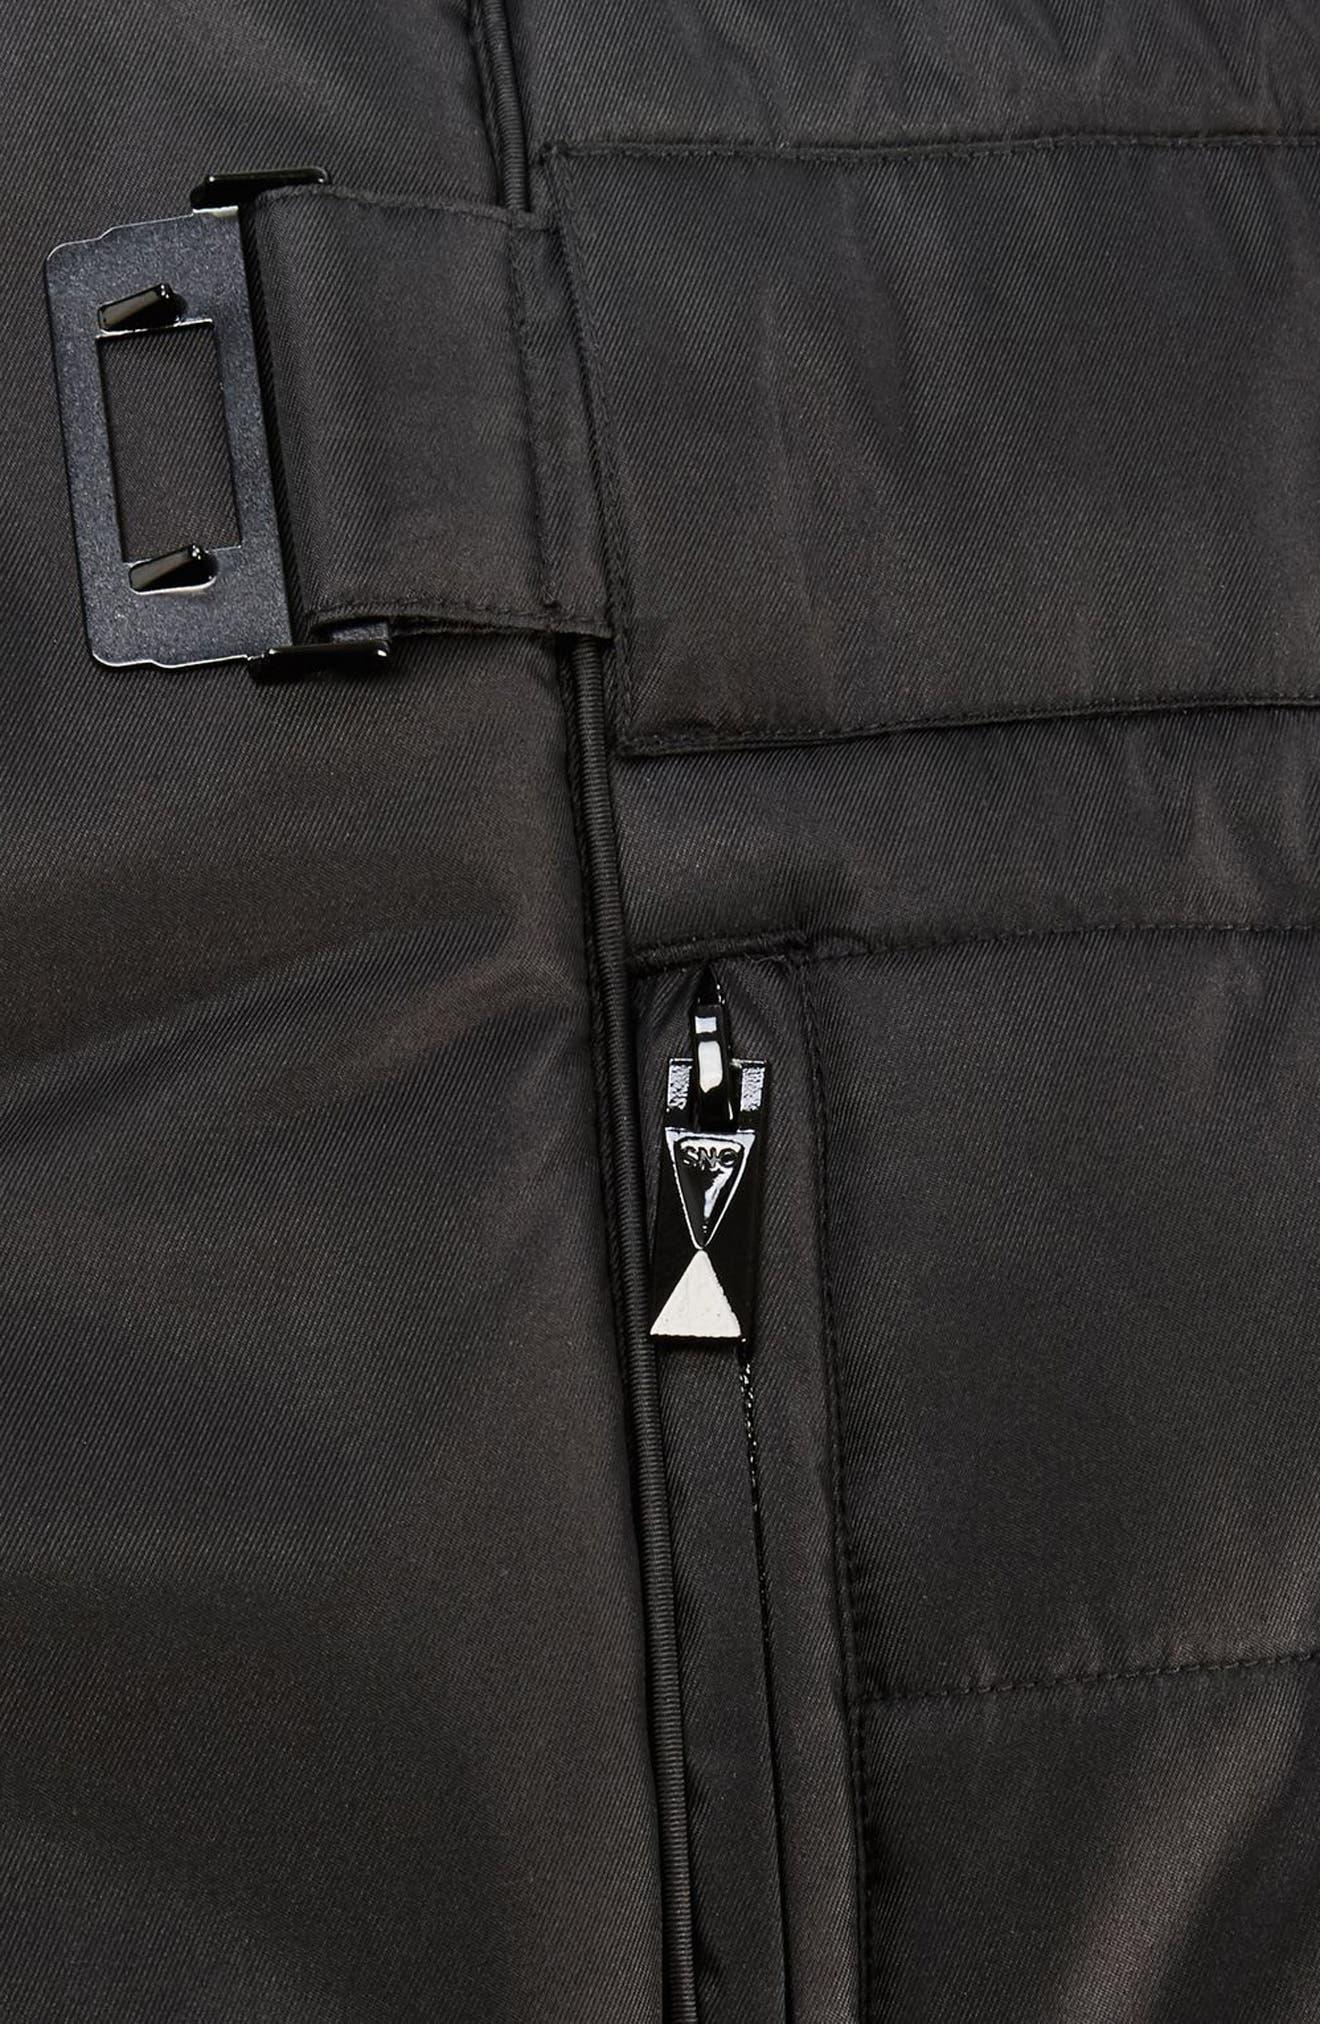 SNO Amazon Puffer Jacket,                             Alternate thumbnail 6, color,                             001